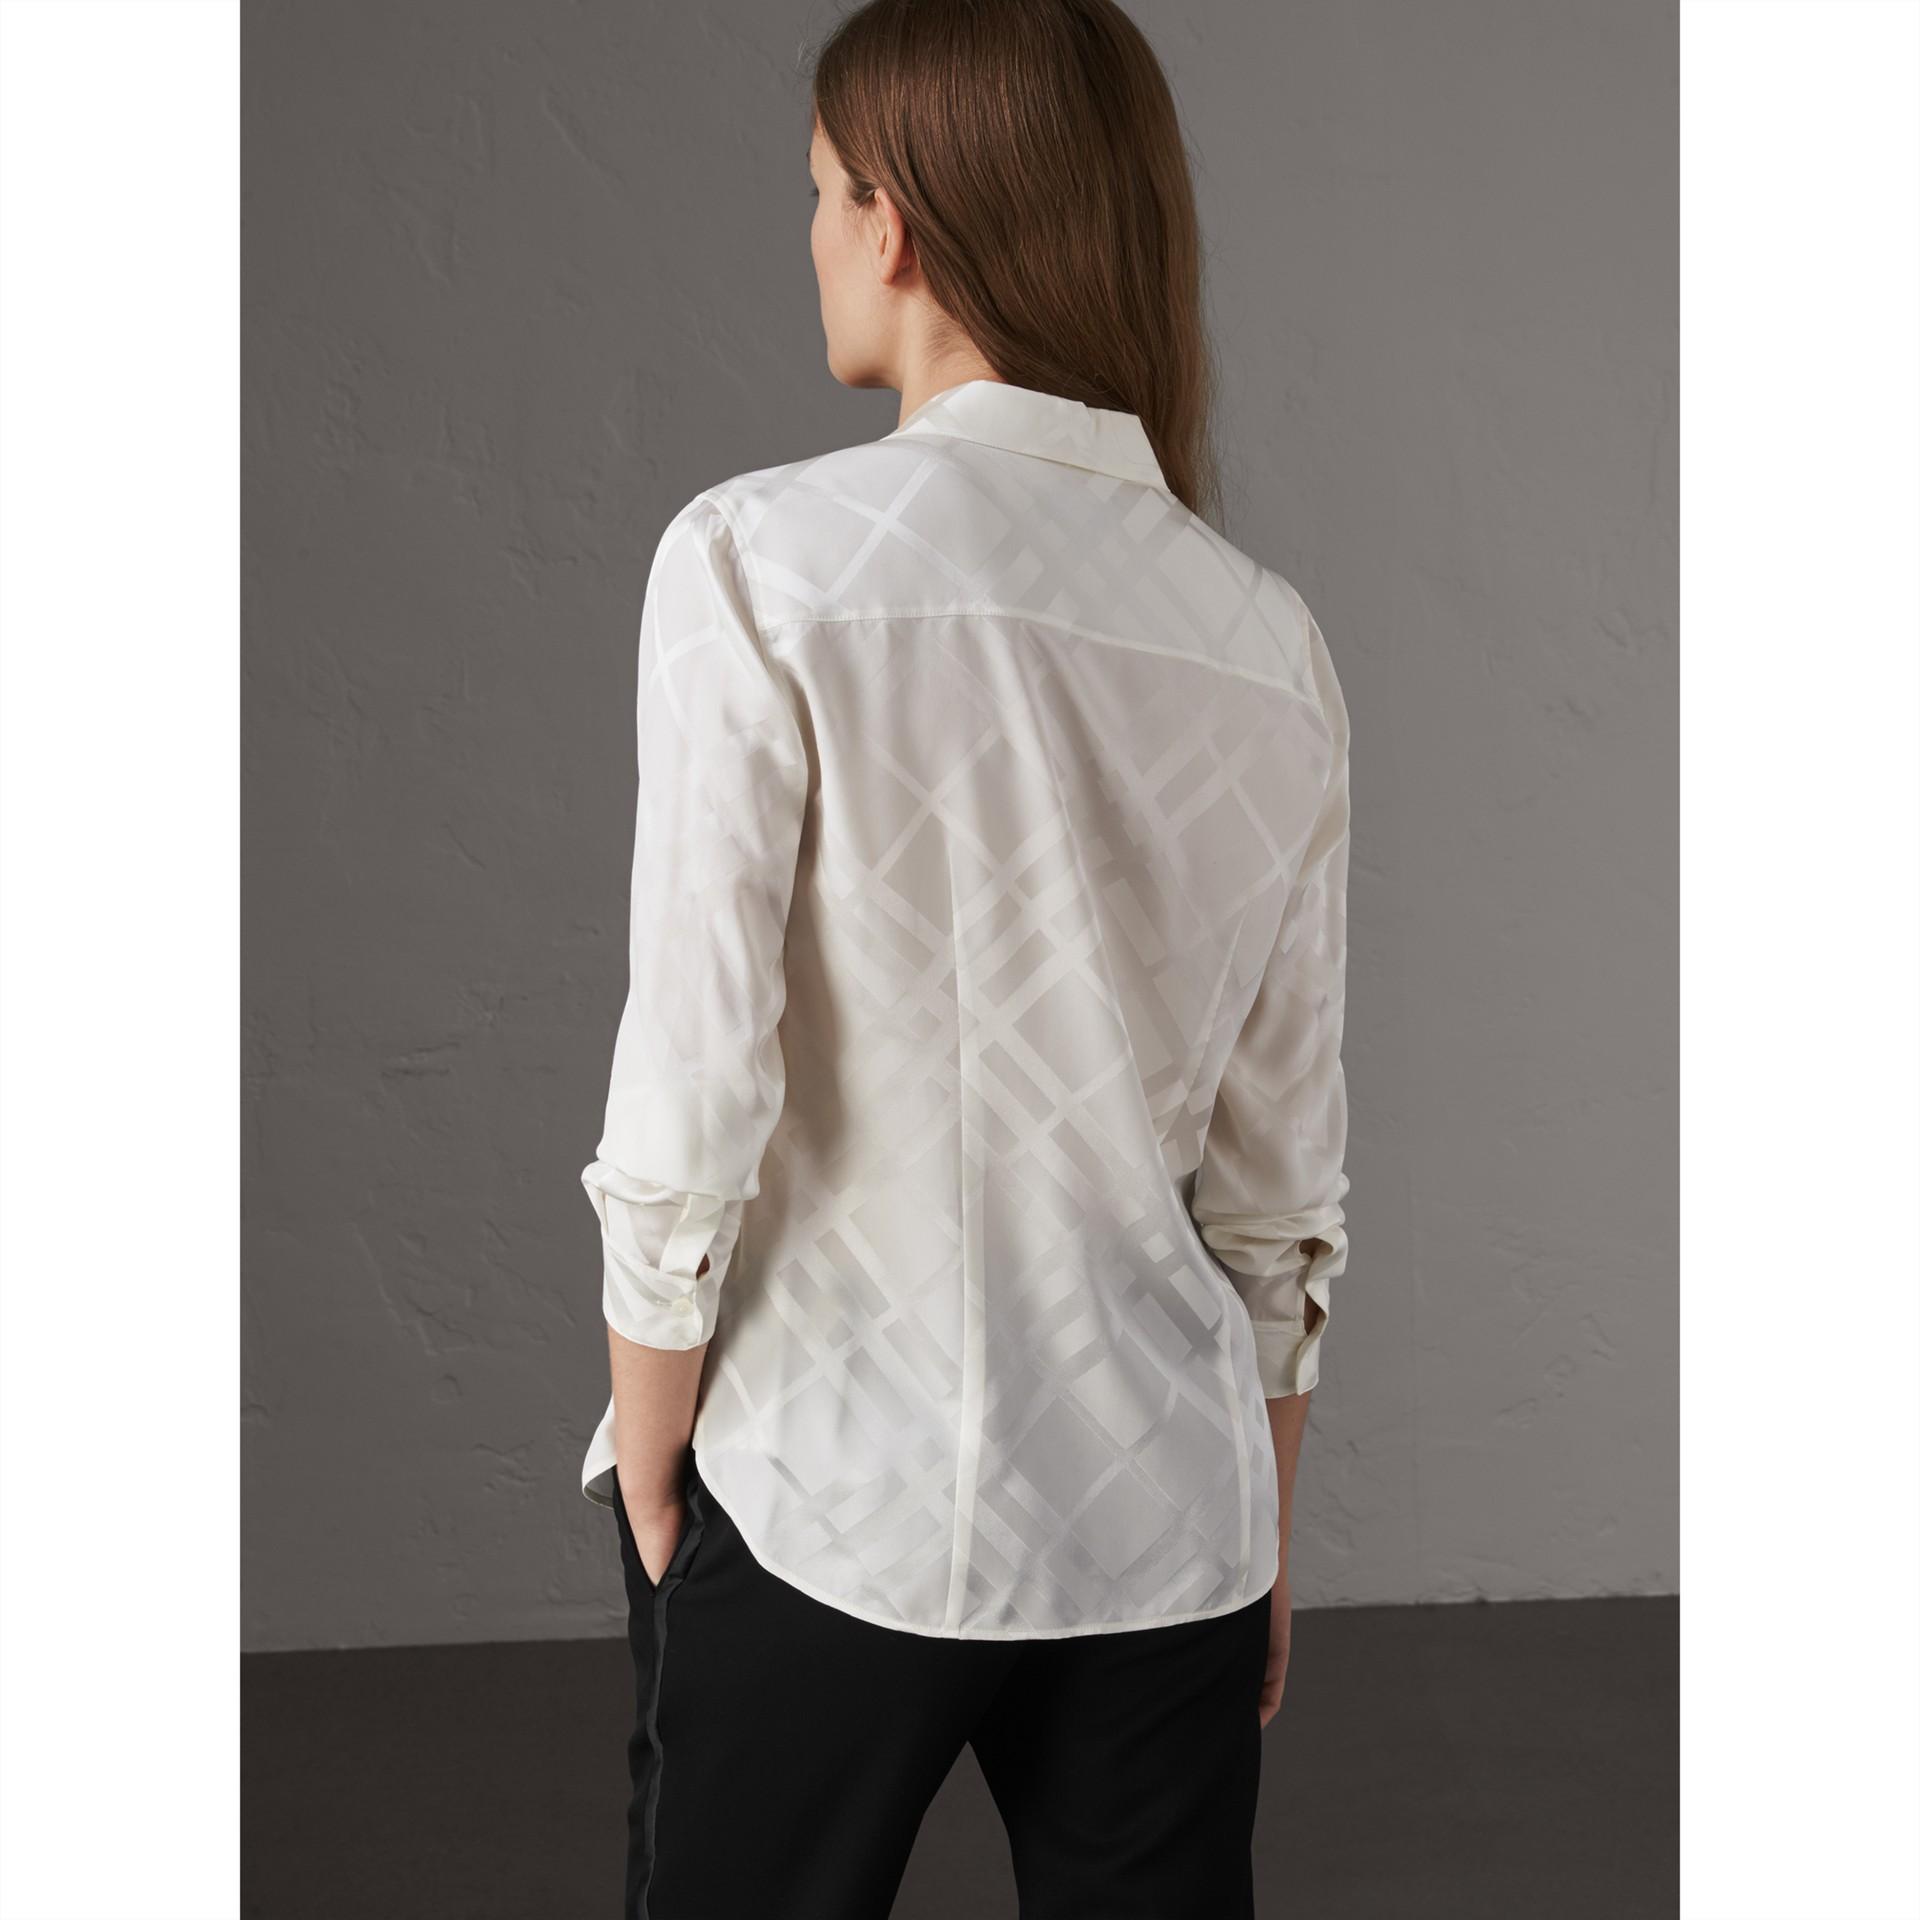 Tonal Check Silk Shirt in White - Women | Burberry Australia - gallery image 3